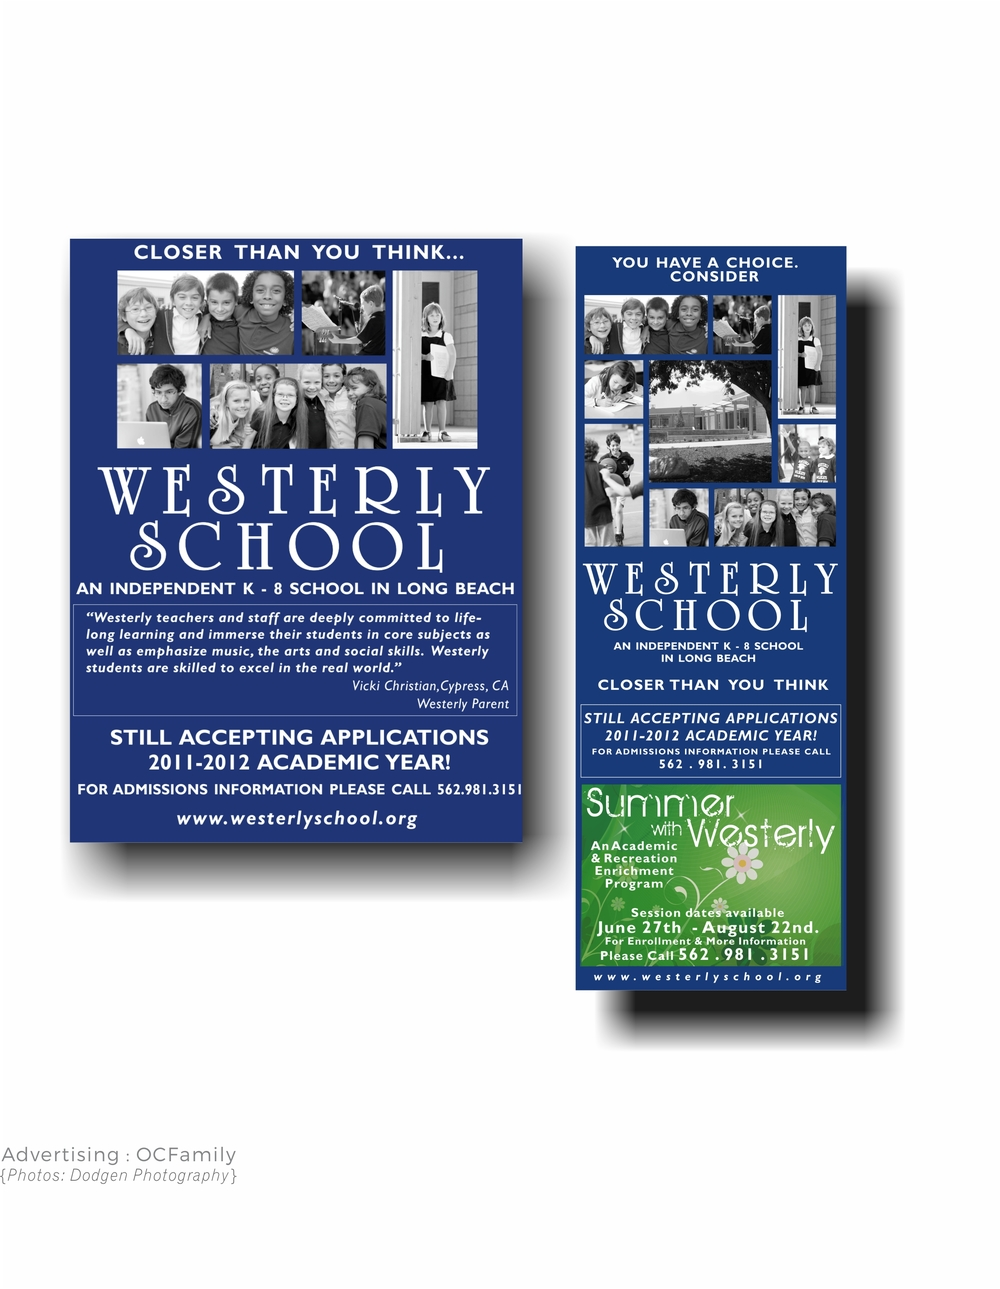 Westerly Advertising & Marketing - 4.jpg